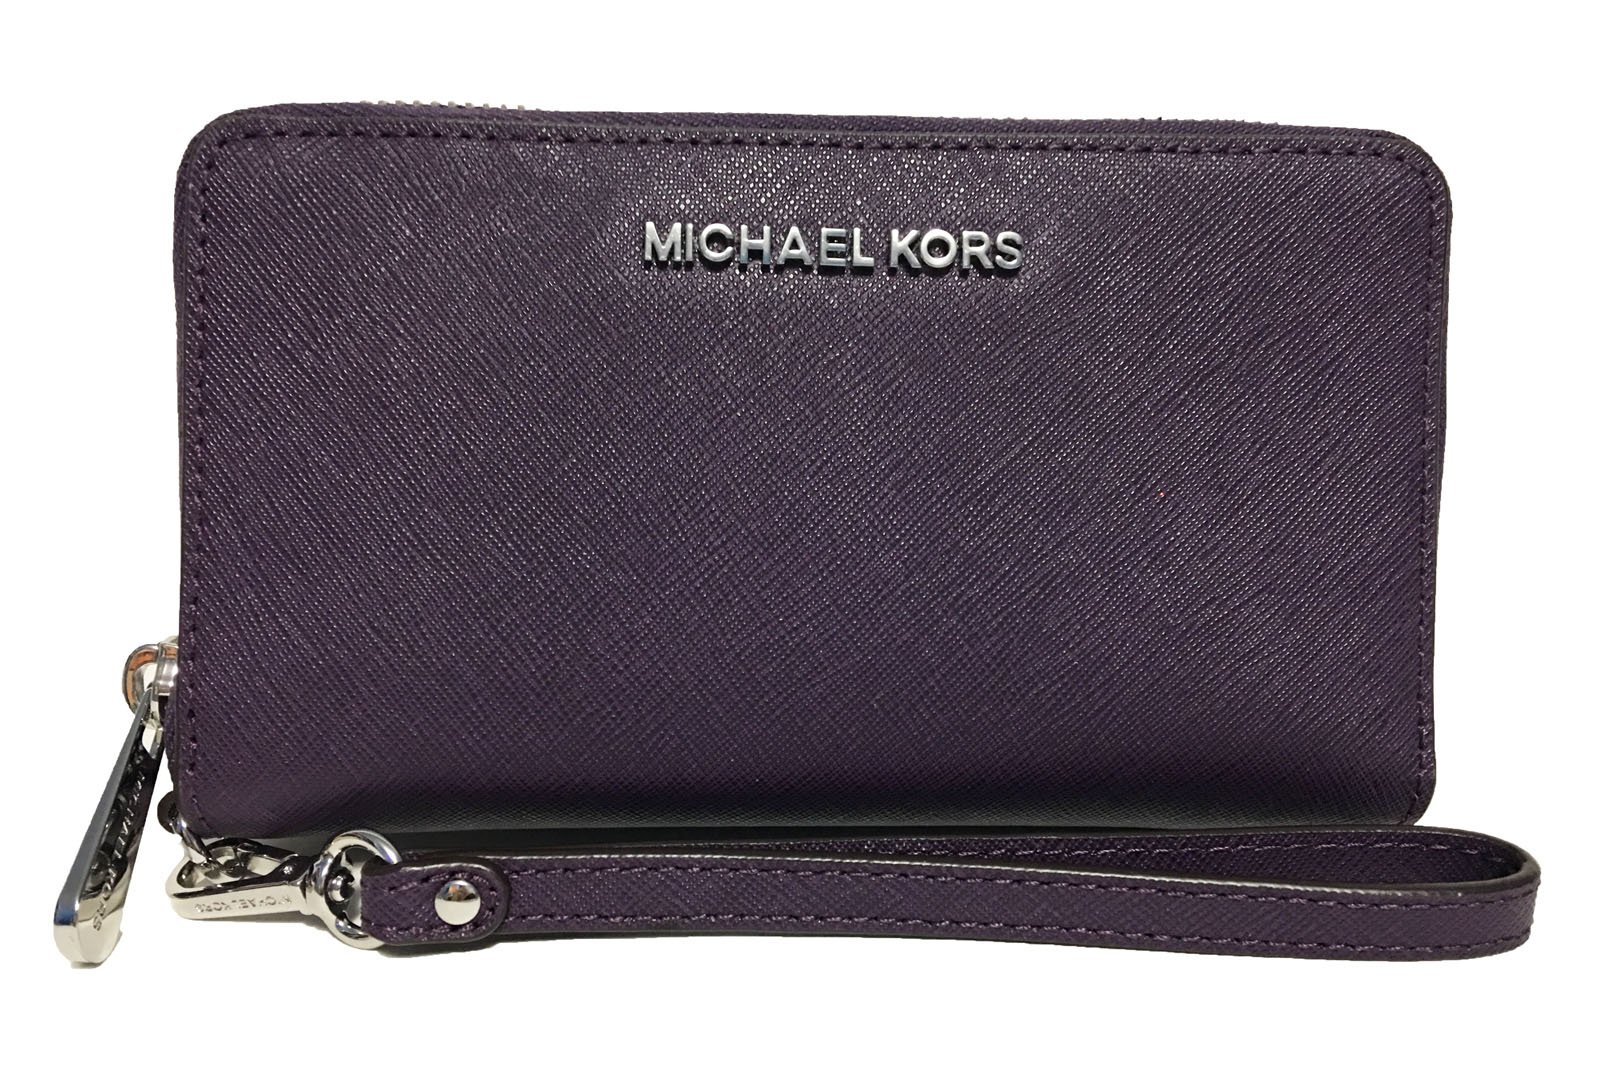 Michael Kors Giftables Jet Set Travel Flat Leather Phone Case (Grape Purple)